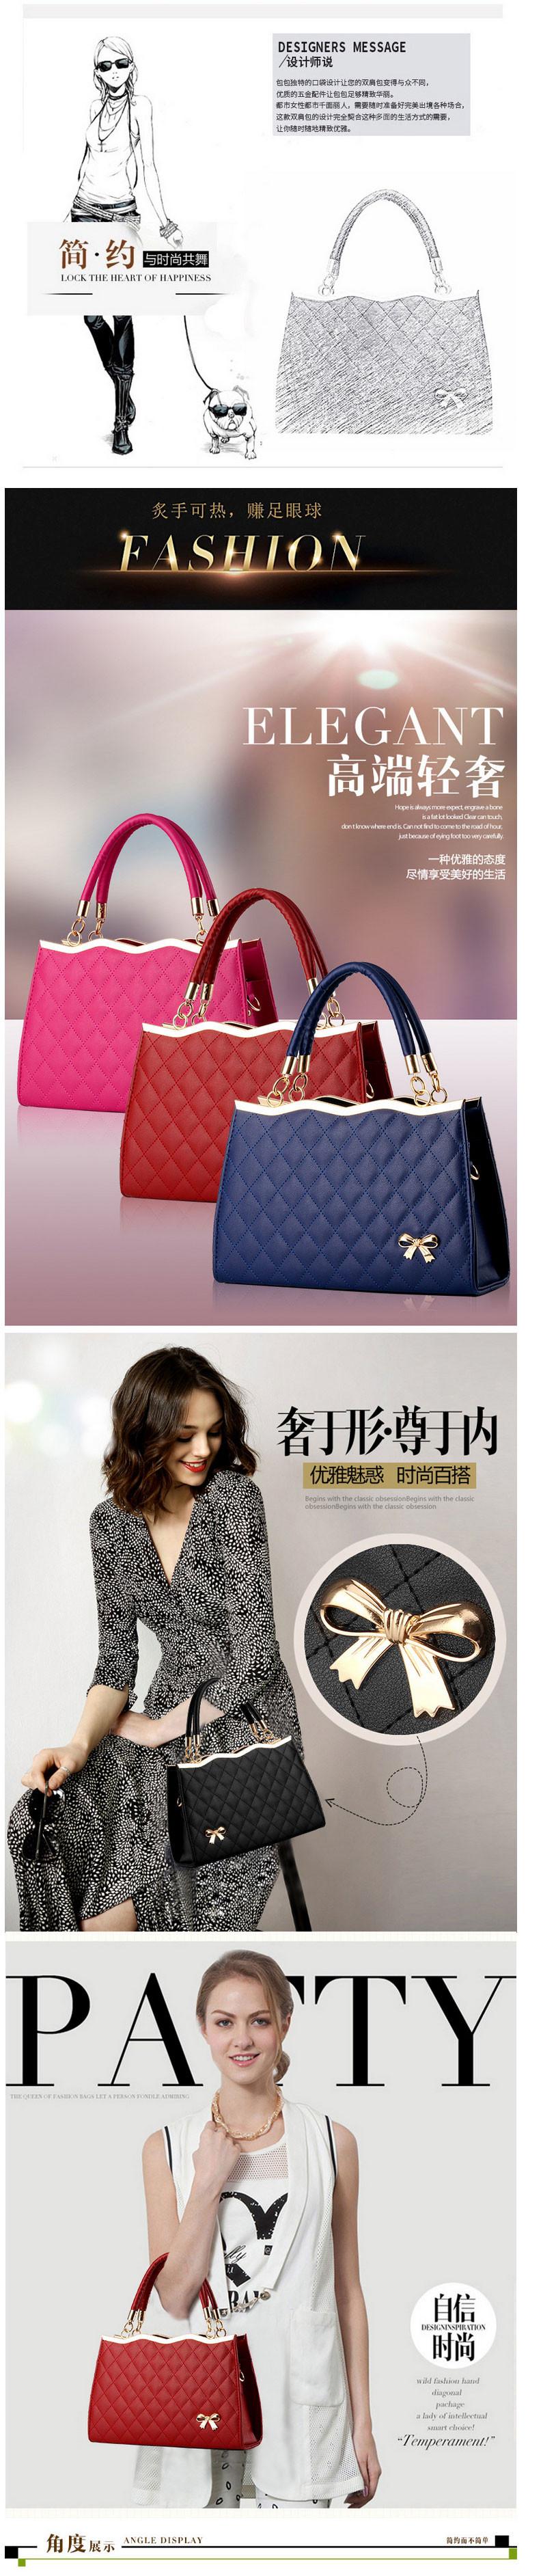 7fc4e0405d67 Shoulder messenger bag High Quality genuine leather bags handbags women  famous brands 2016 Fashion Ladies dollar price 1724. 0 NB360 01 NB360 03 ...